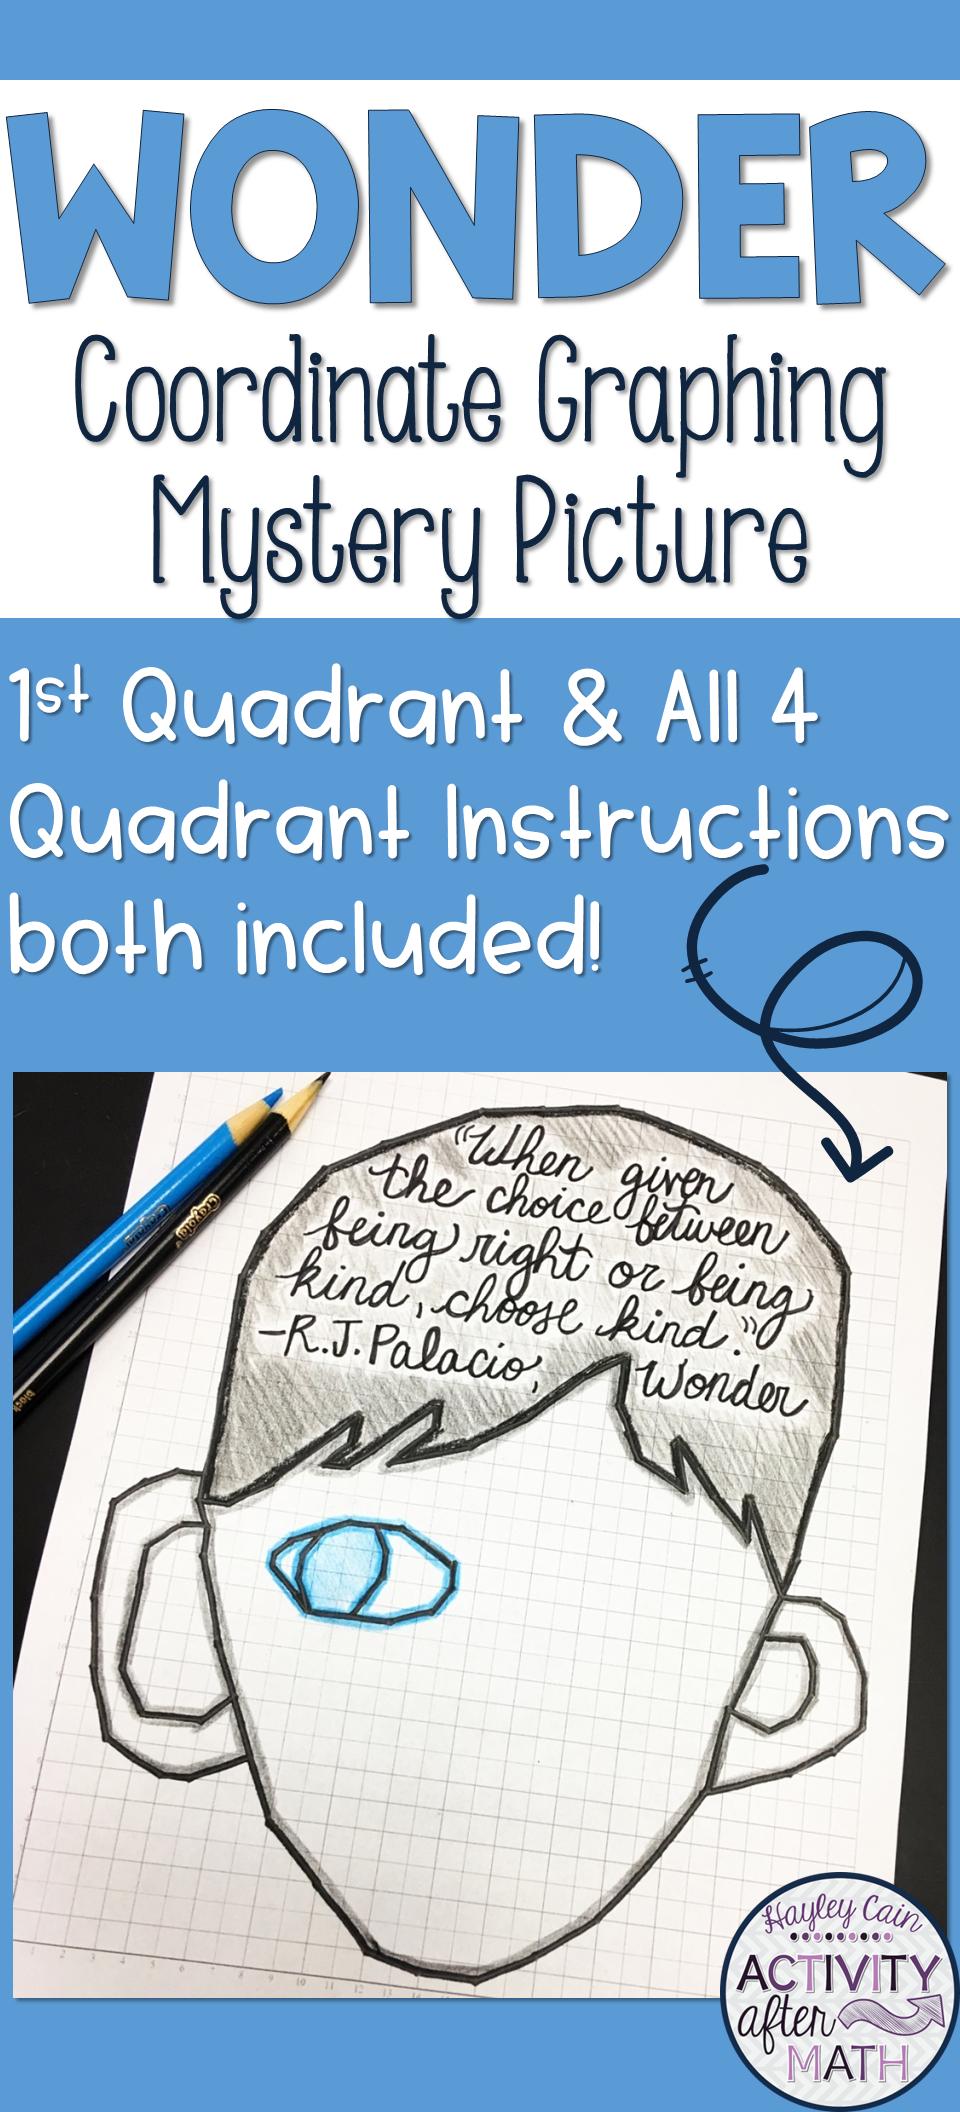 Wonder Coordinate Graphing Picture 1st Quadrant & ALL 4 Quadrants ...